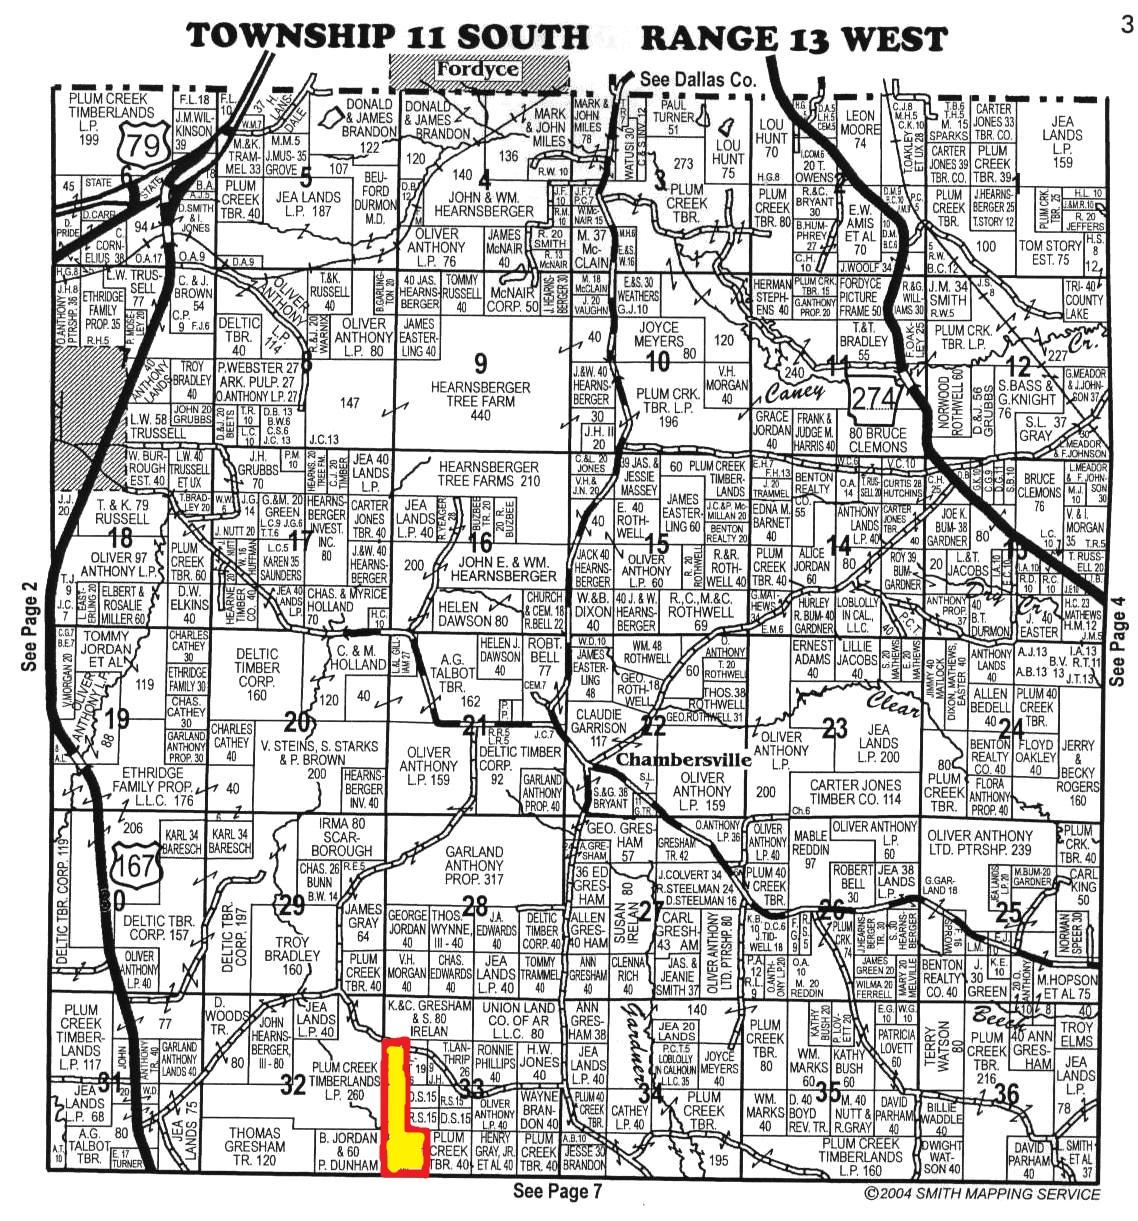 AcresThorton AR Calhoun County - Arkansas land ownership maps